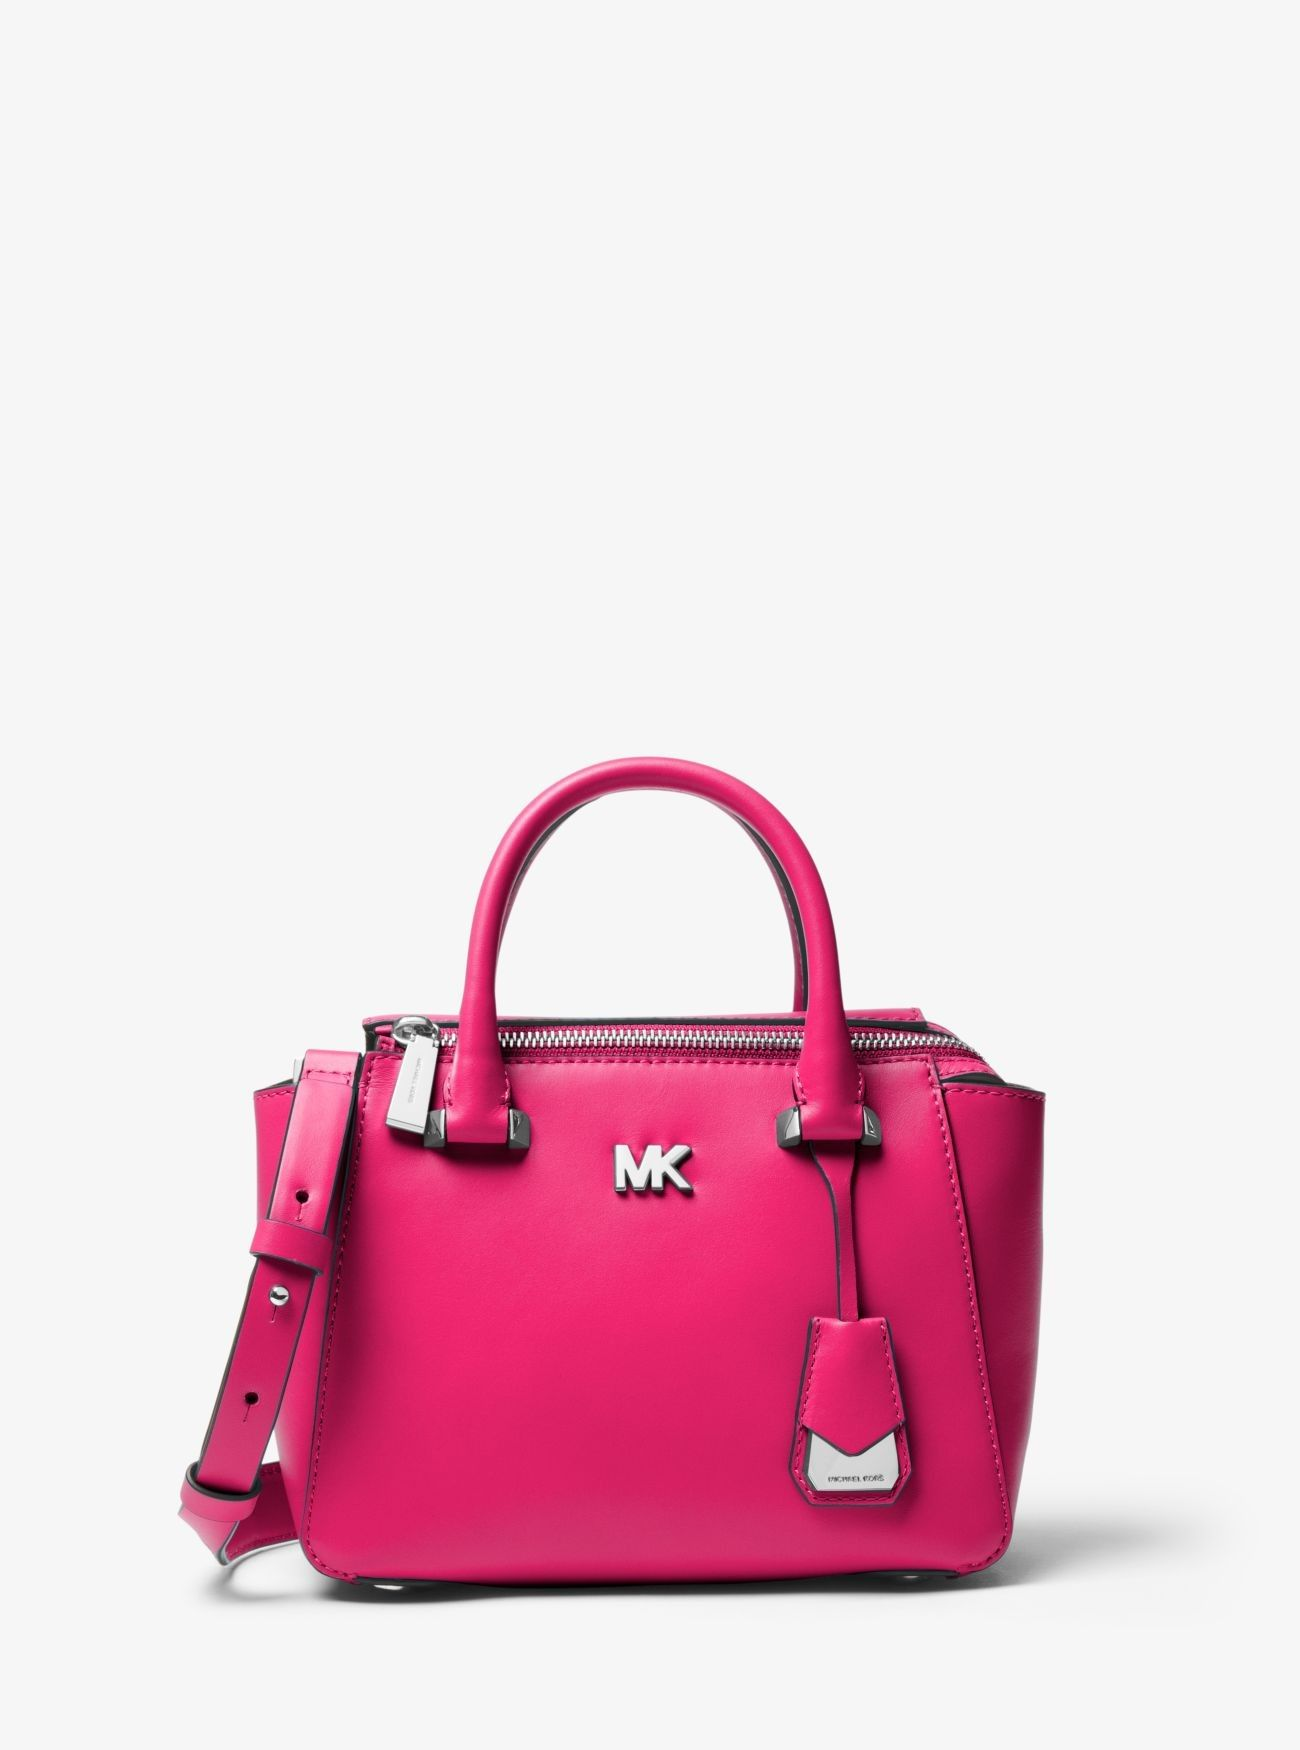 Online Michael Kors Ultra Pink Nolita Mini Leather Satchel Outlet Sale 5871bf772f